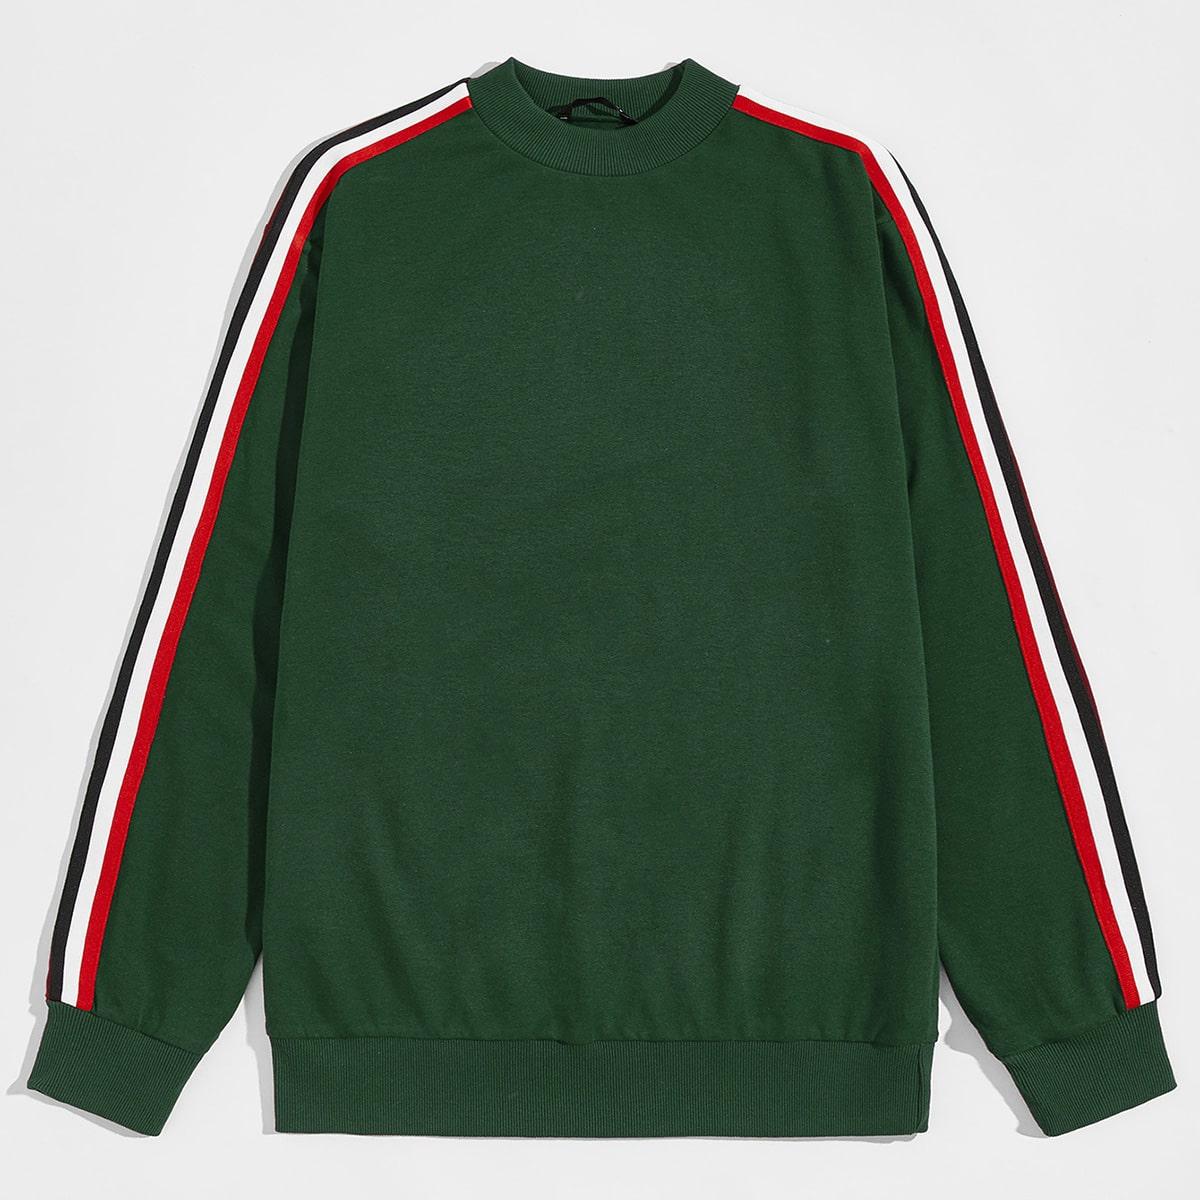 Мужской пуловер с полосками от SHEIN